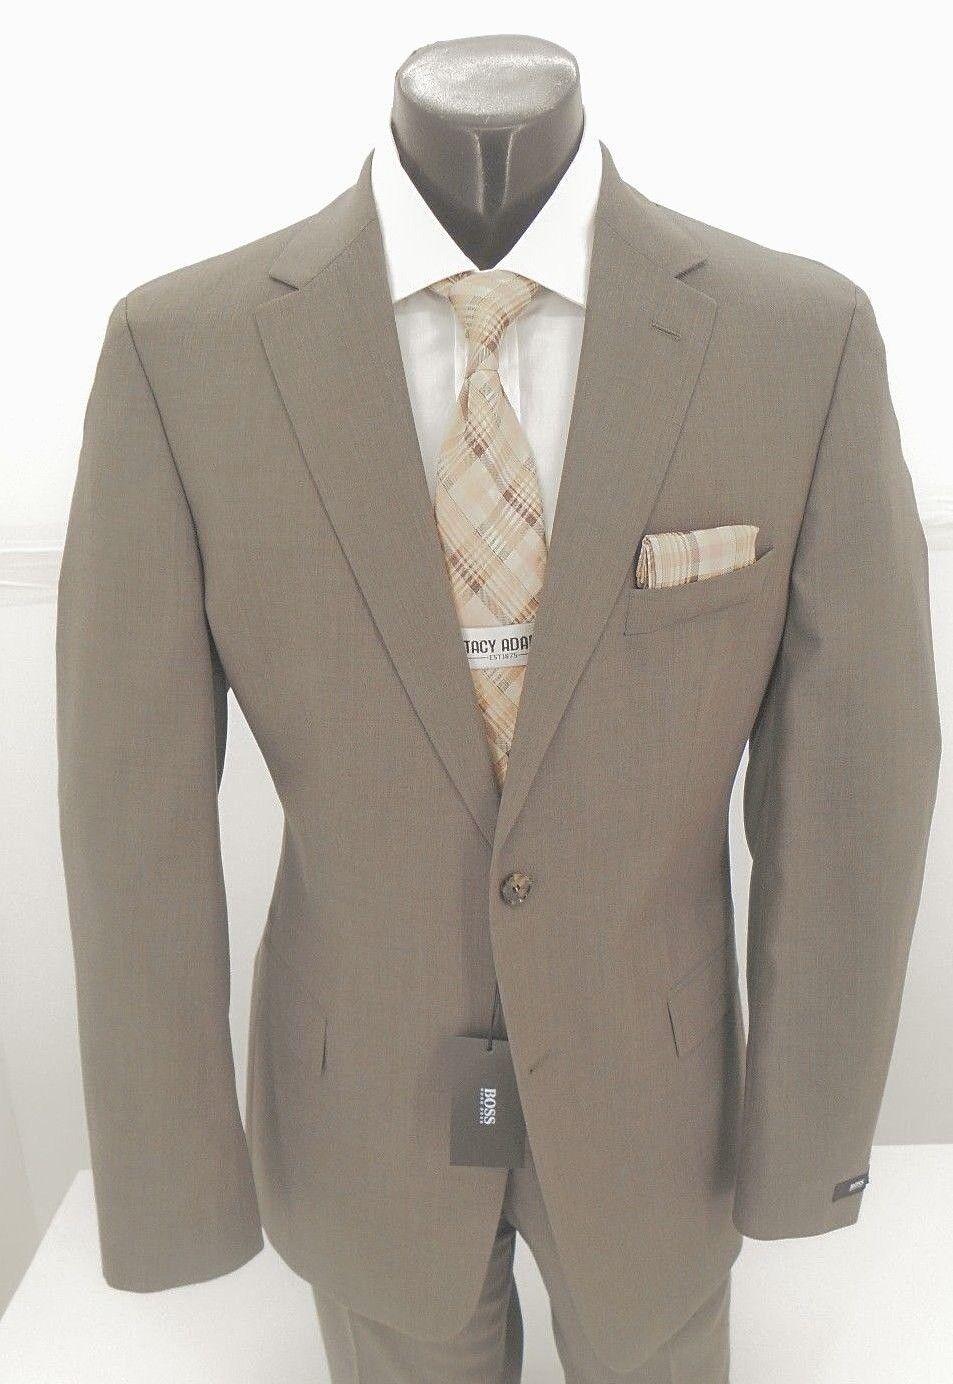 Hugo Boss Med Braun 2B  Virgin Wool   Herren Classic Fit Suit 389.99 USA  44R